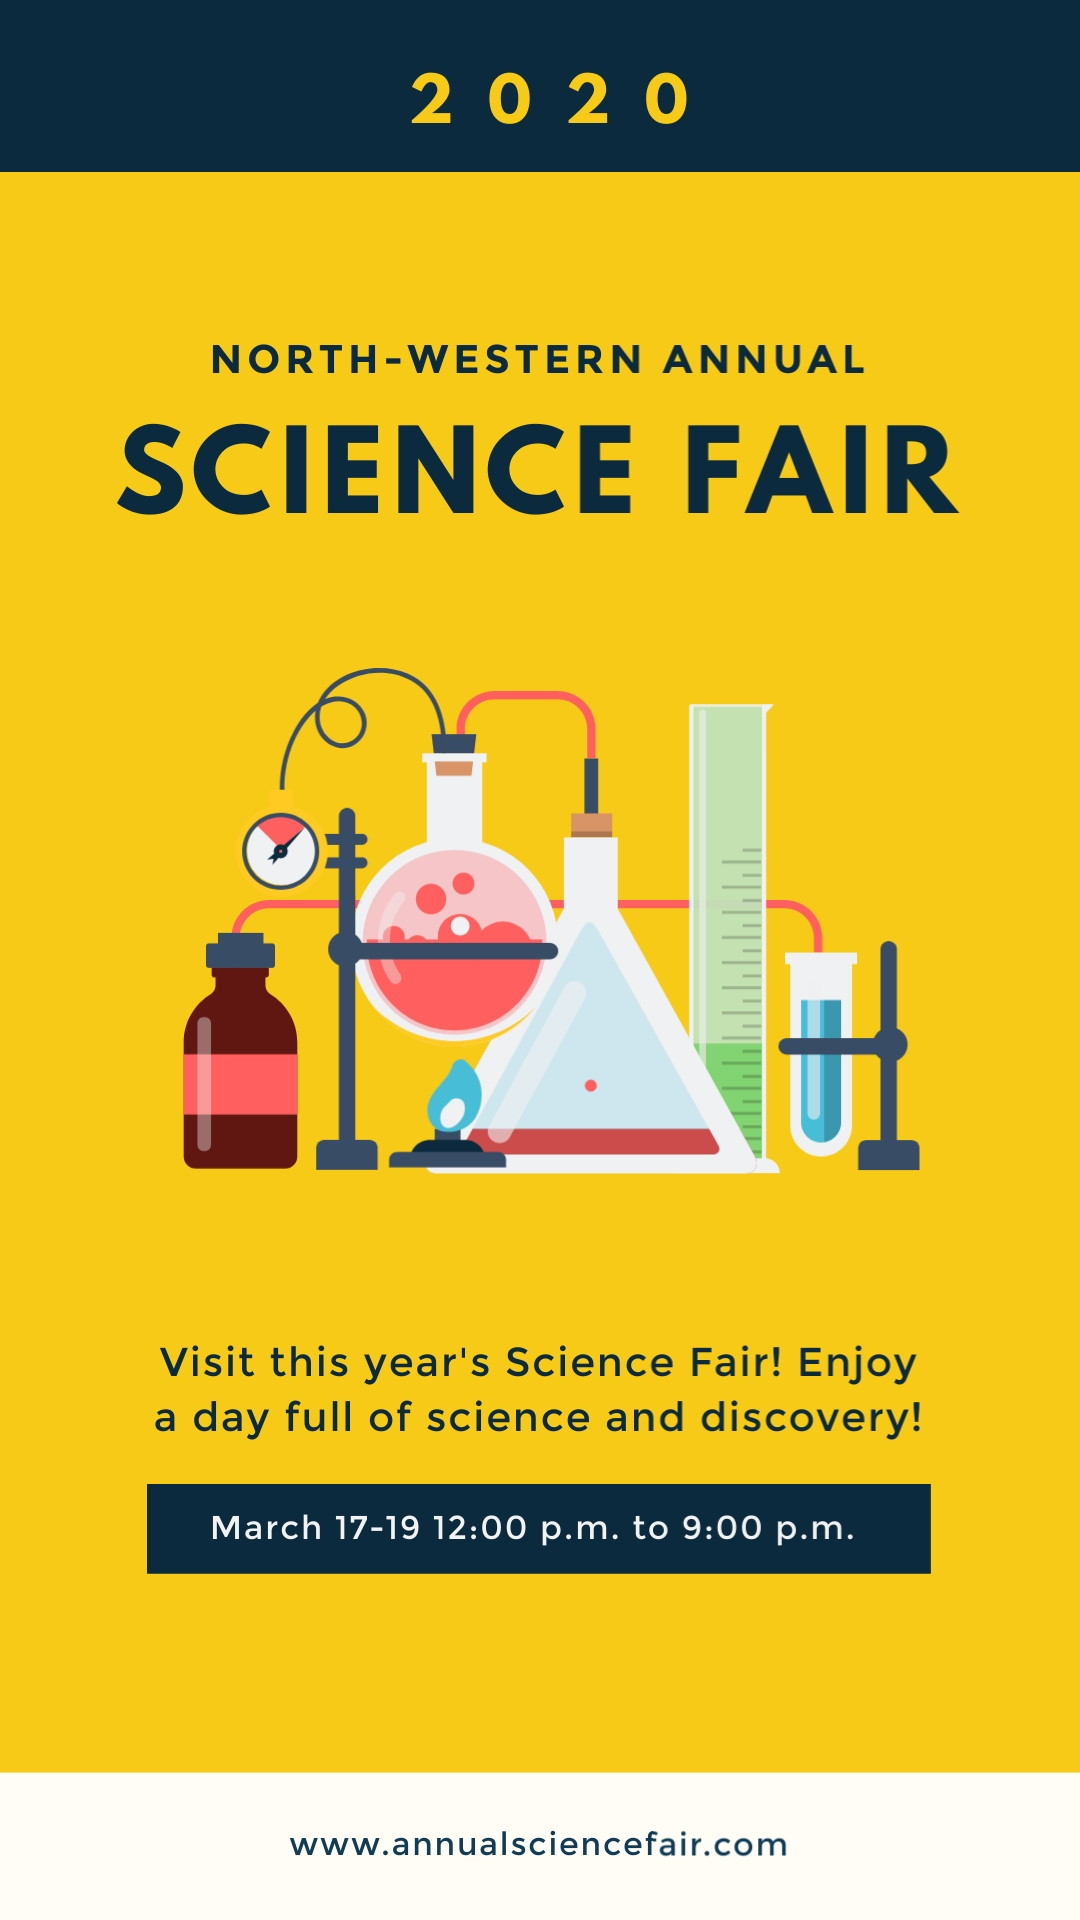 Science Fair Vertical Template